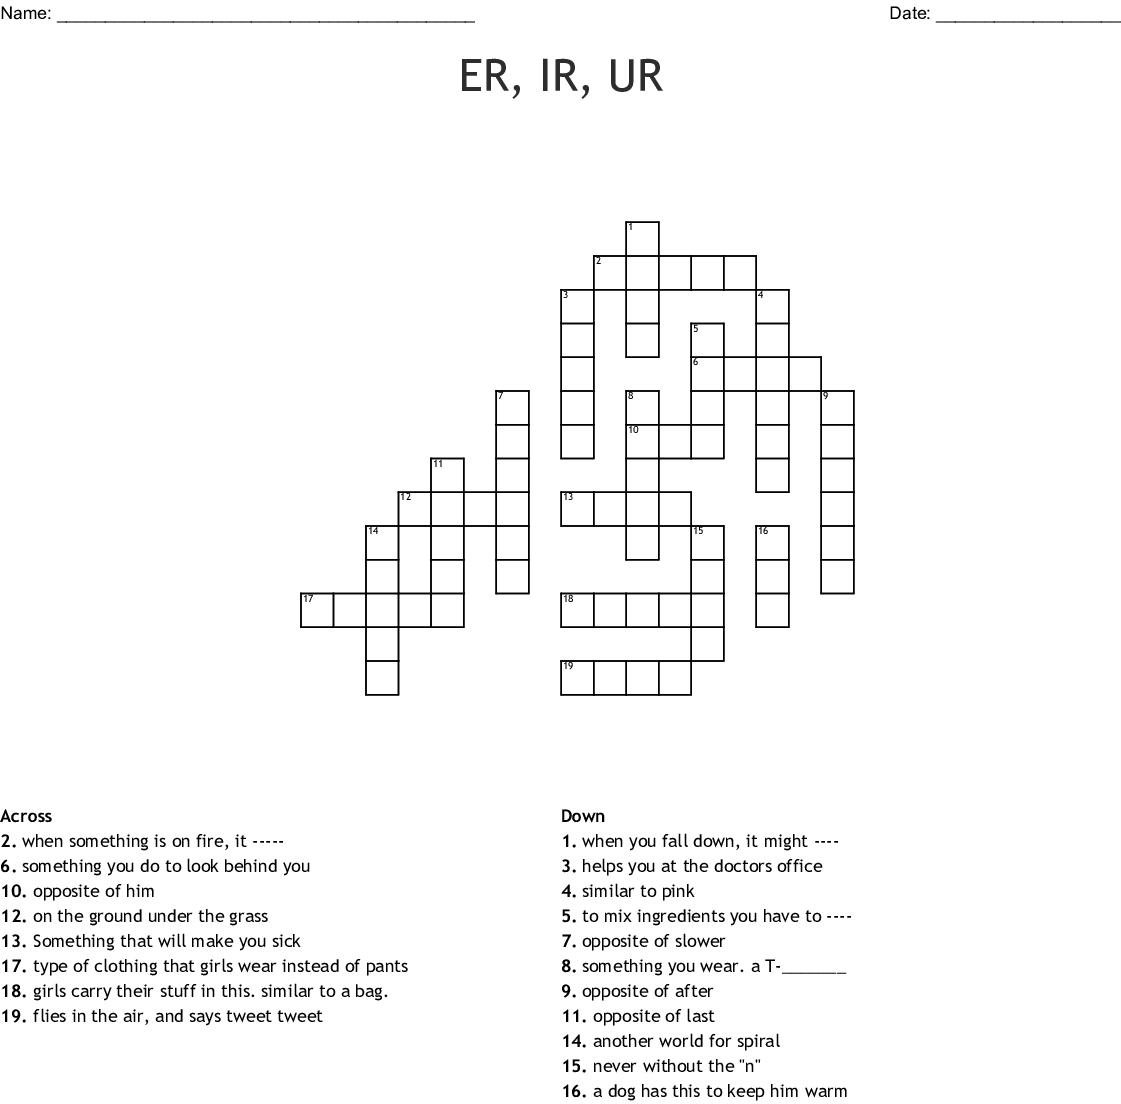 Er Ir Ur Crossword